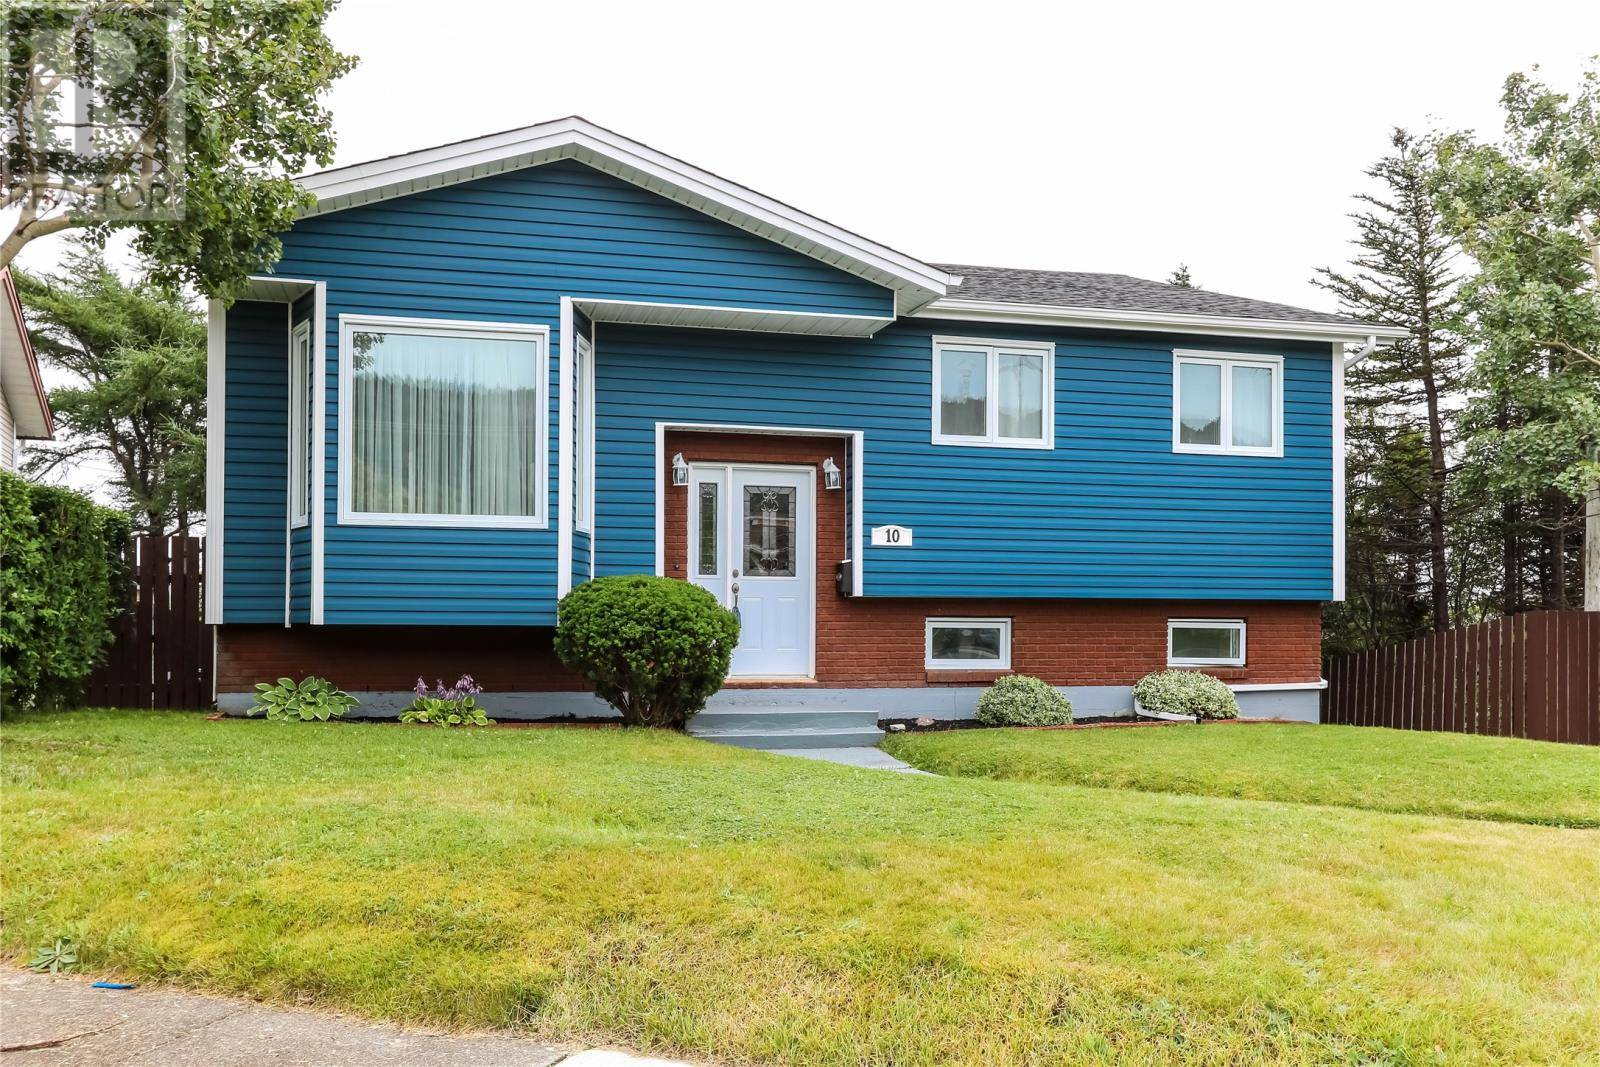 House for sale at 10 Fair Haven Pl St. John's Newfoundland - MLS: 1207410